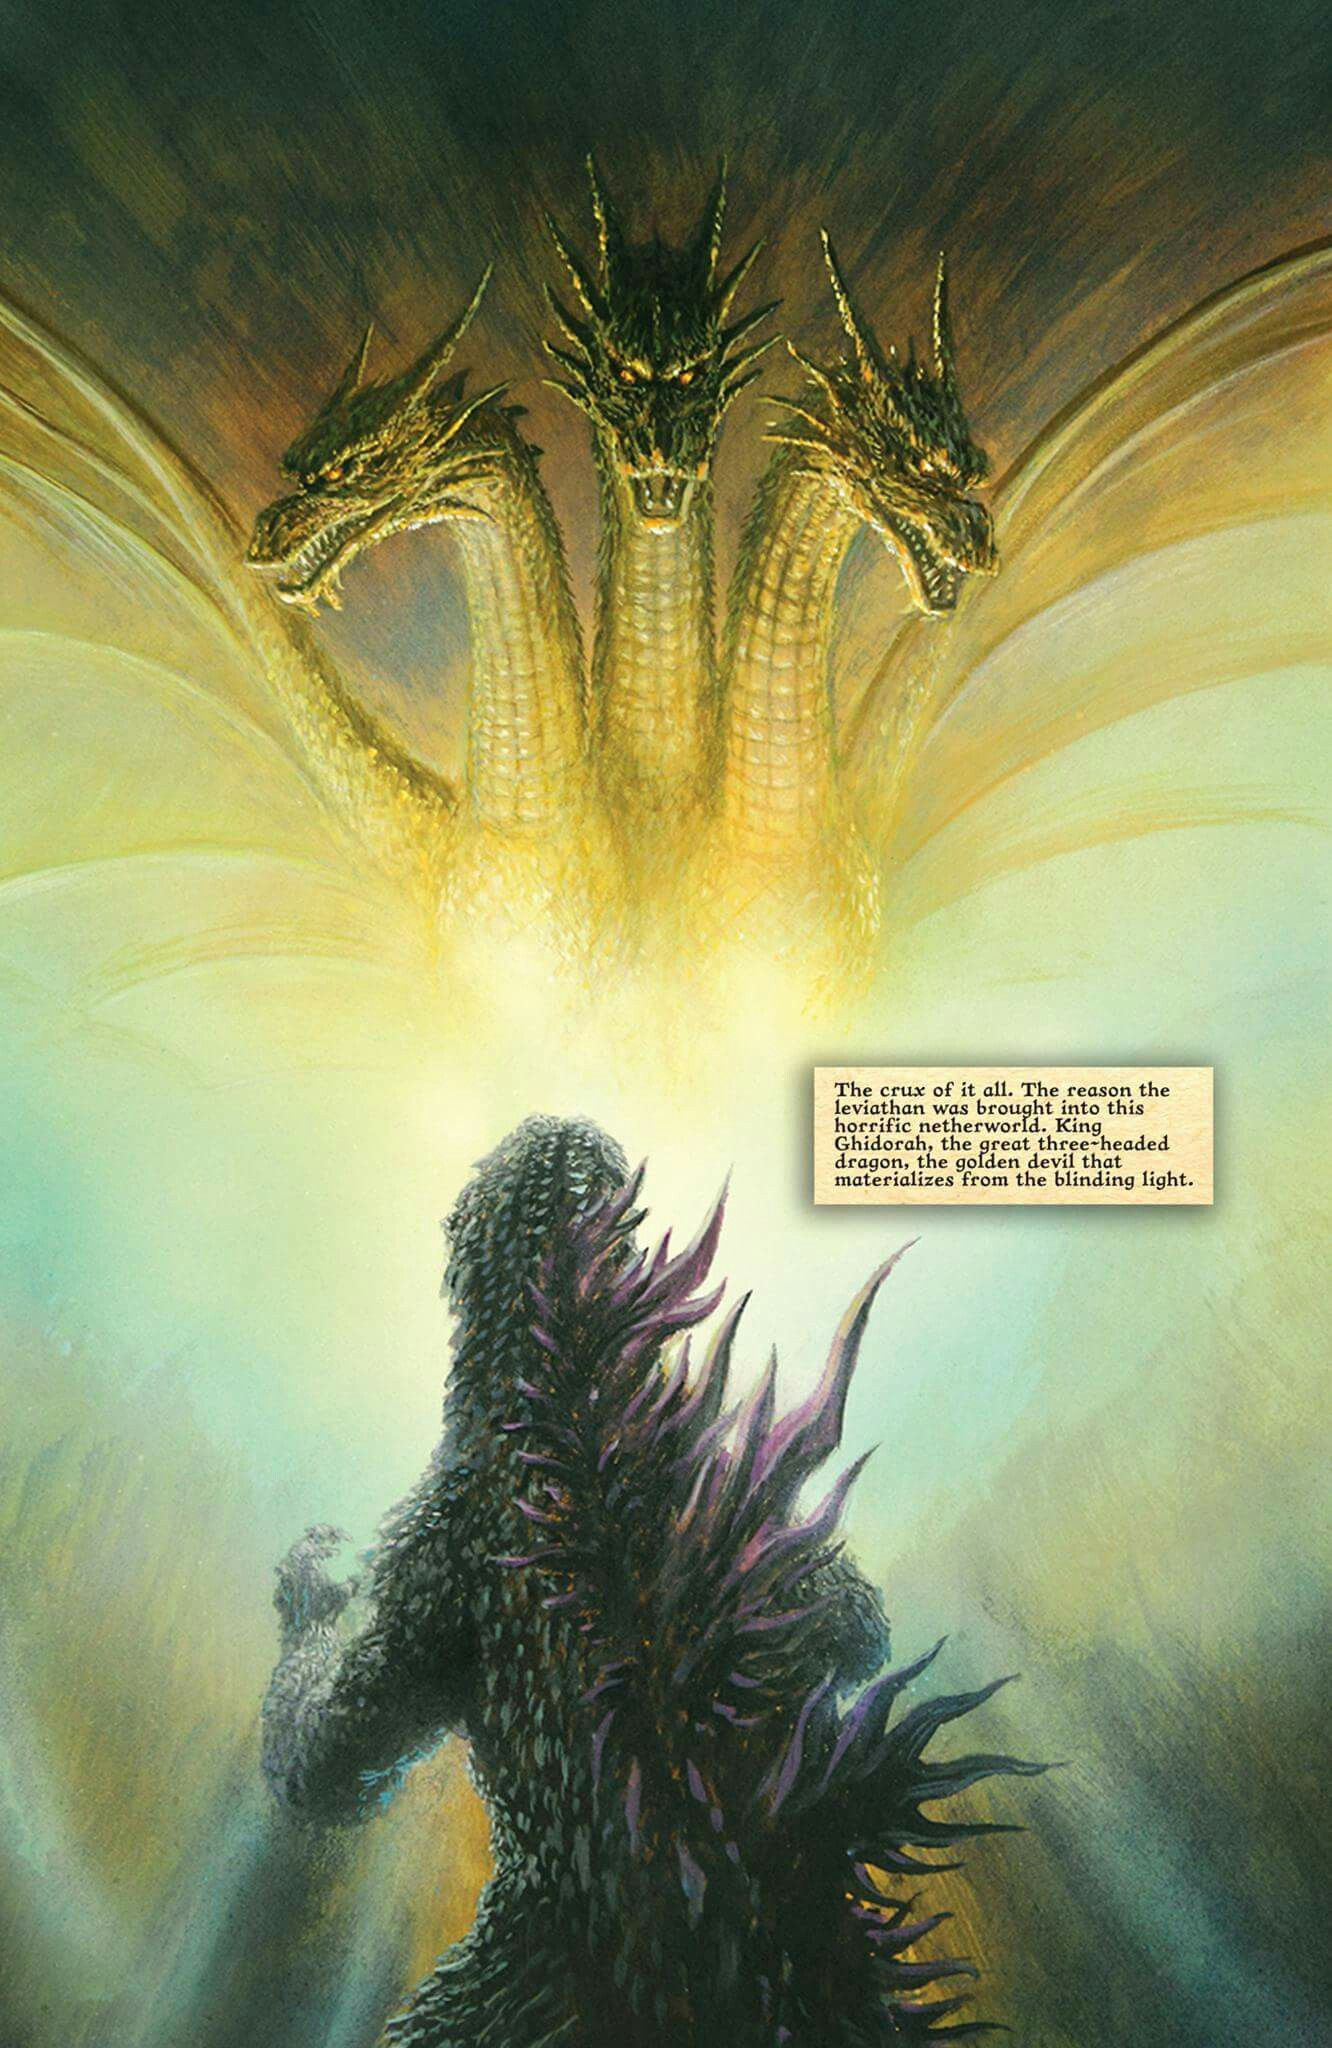 Godzilla vs king ghidorah godzilla kaiju monsters kong